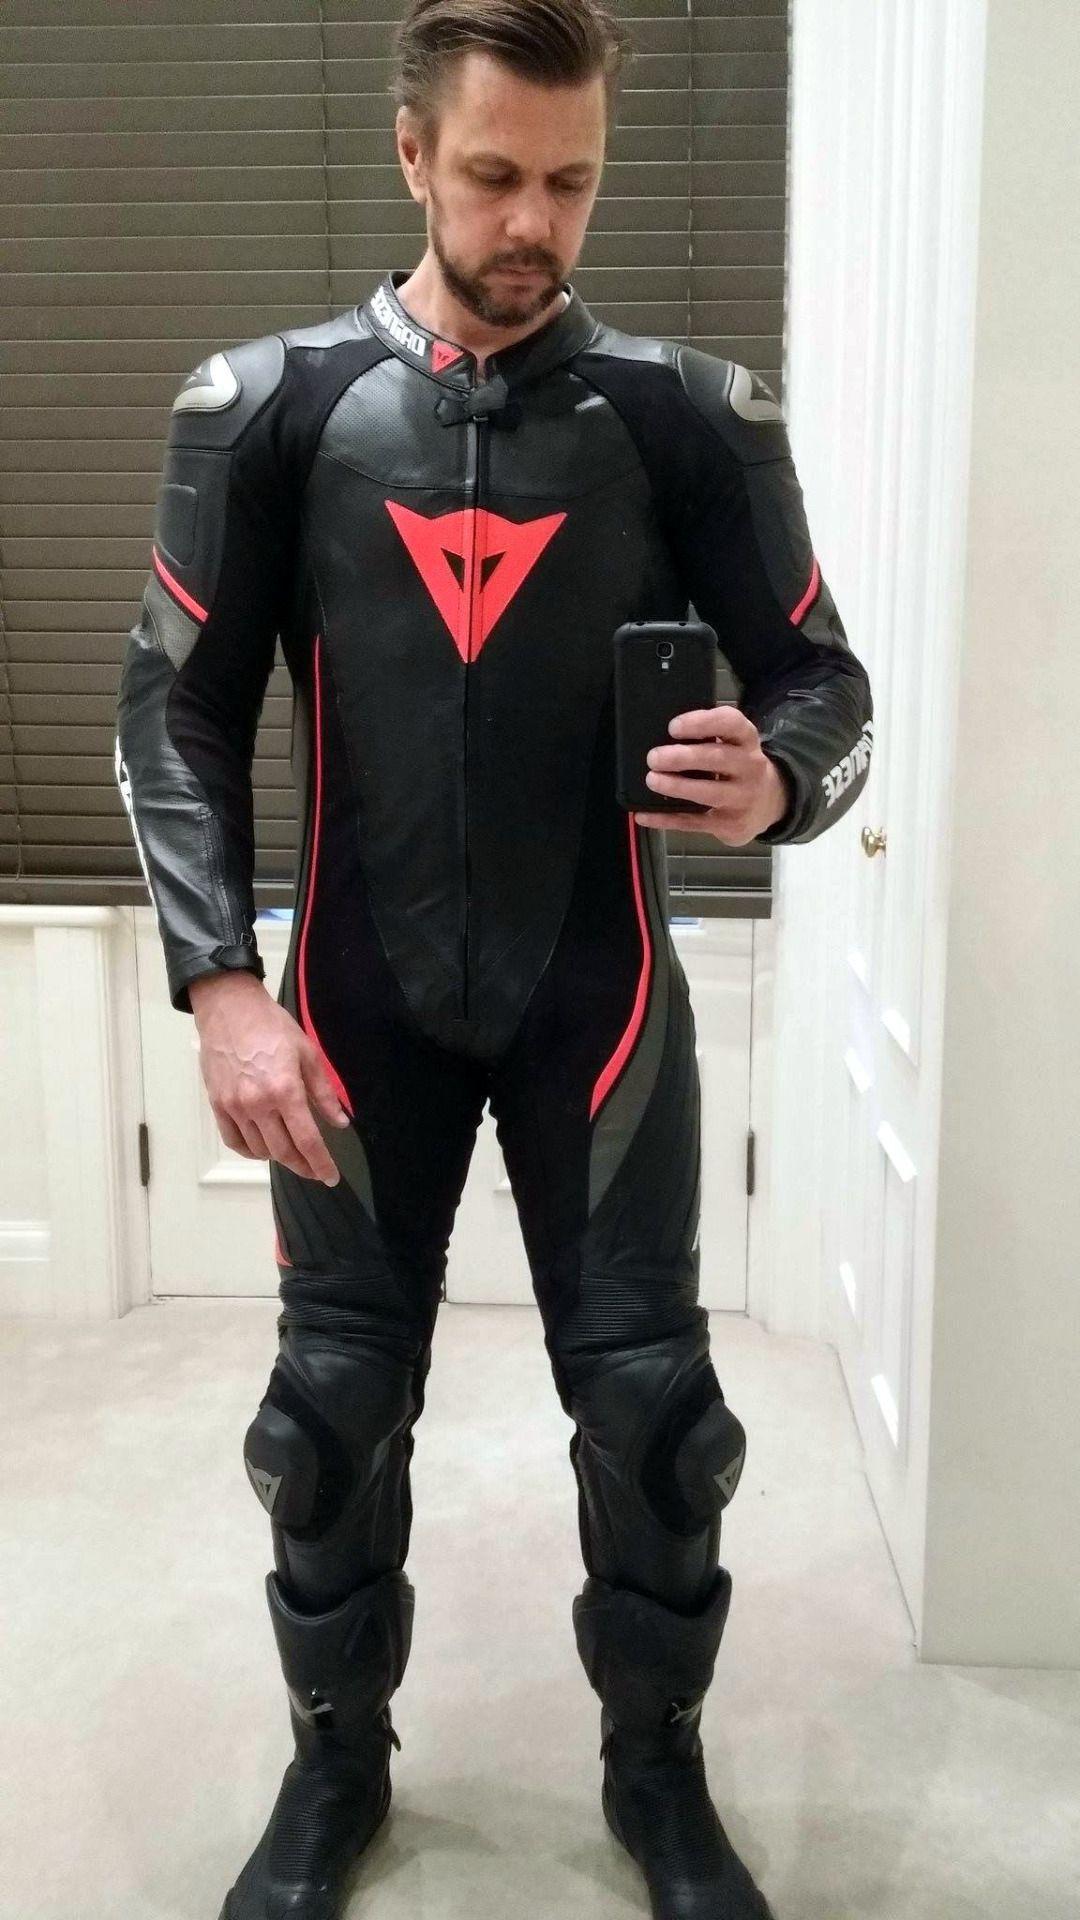 Leather Biker Gay Bondage - Gay - Tendfycom-7588